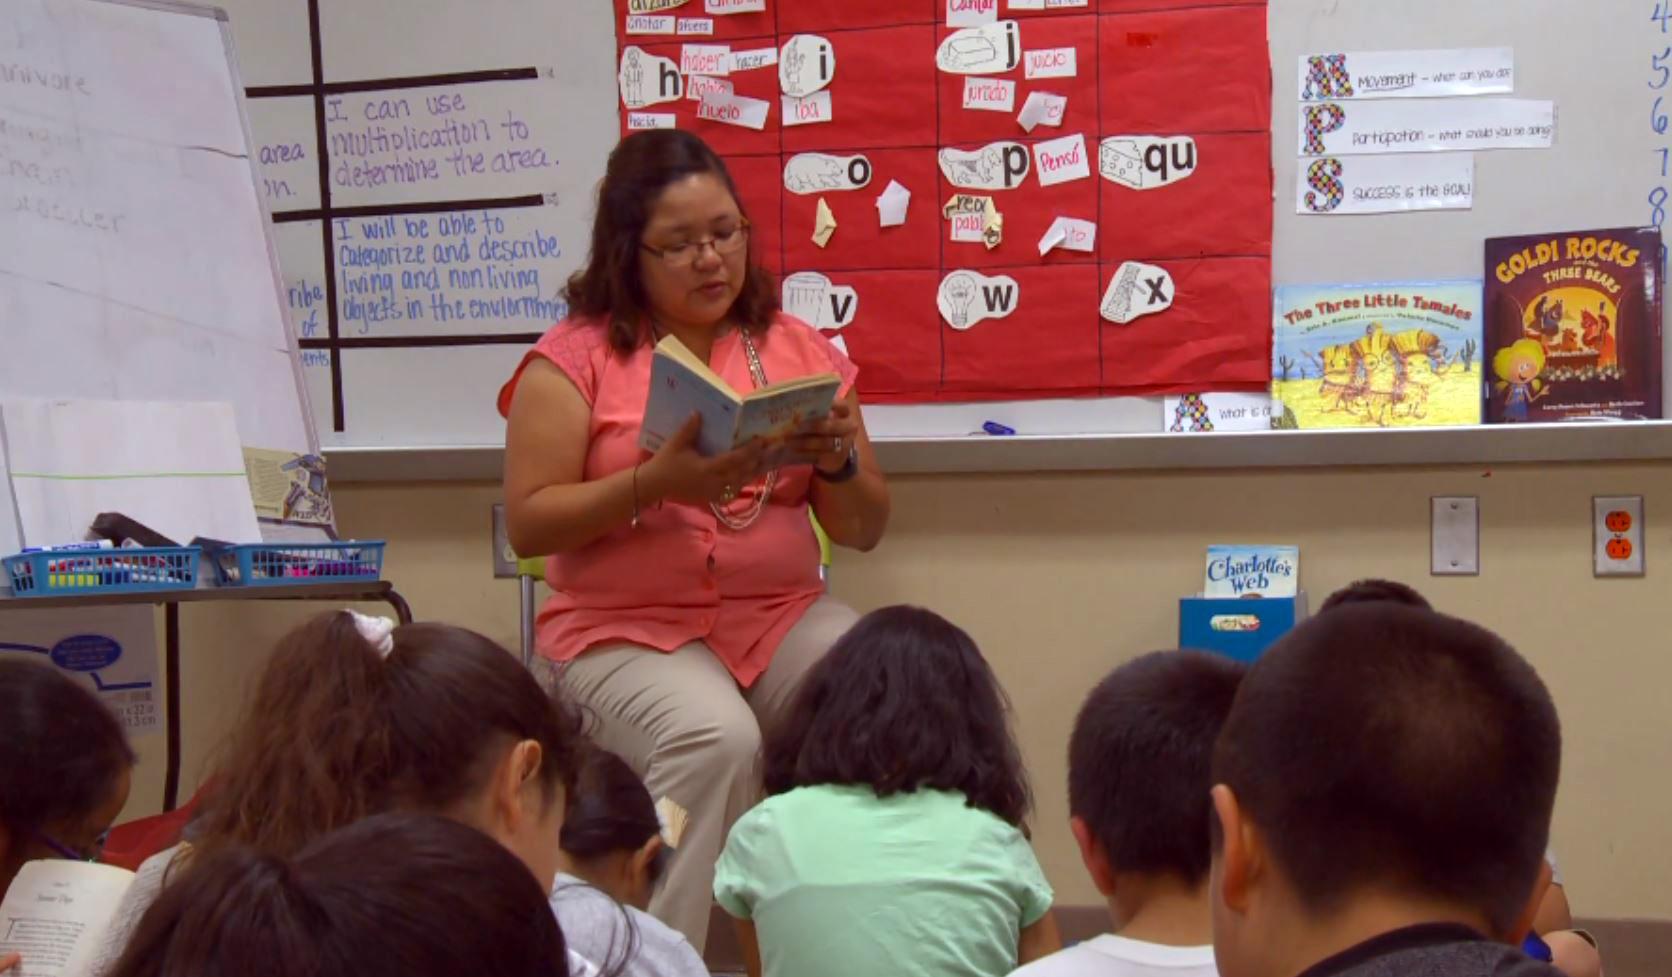 Hemphill Elementary School third grade teacher Natalie Martinez-Esparza._477030